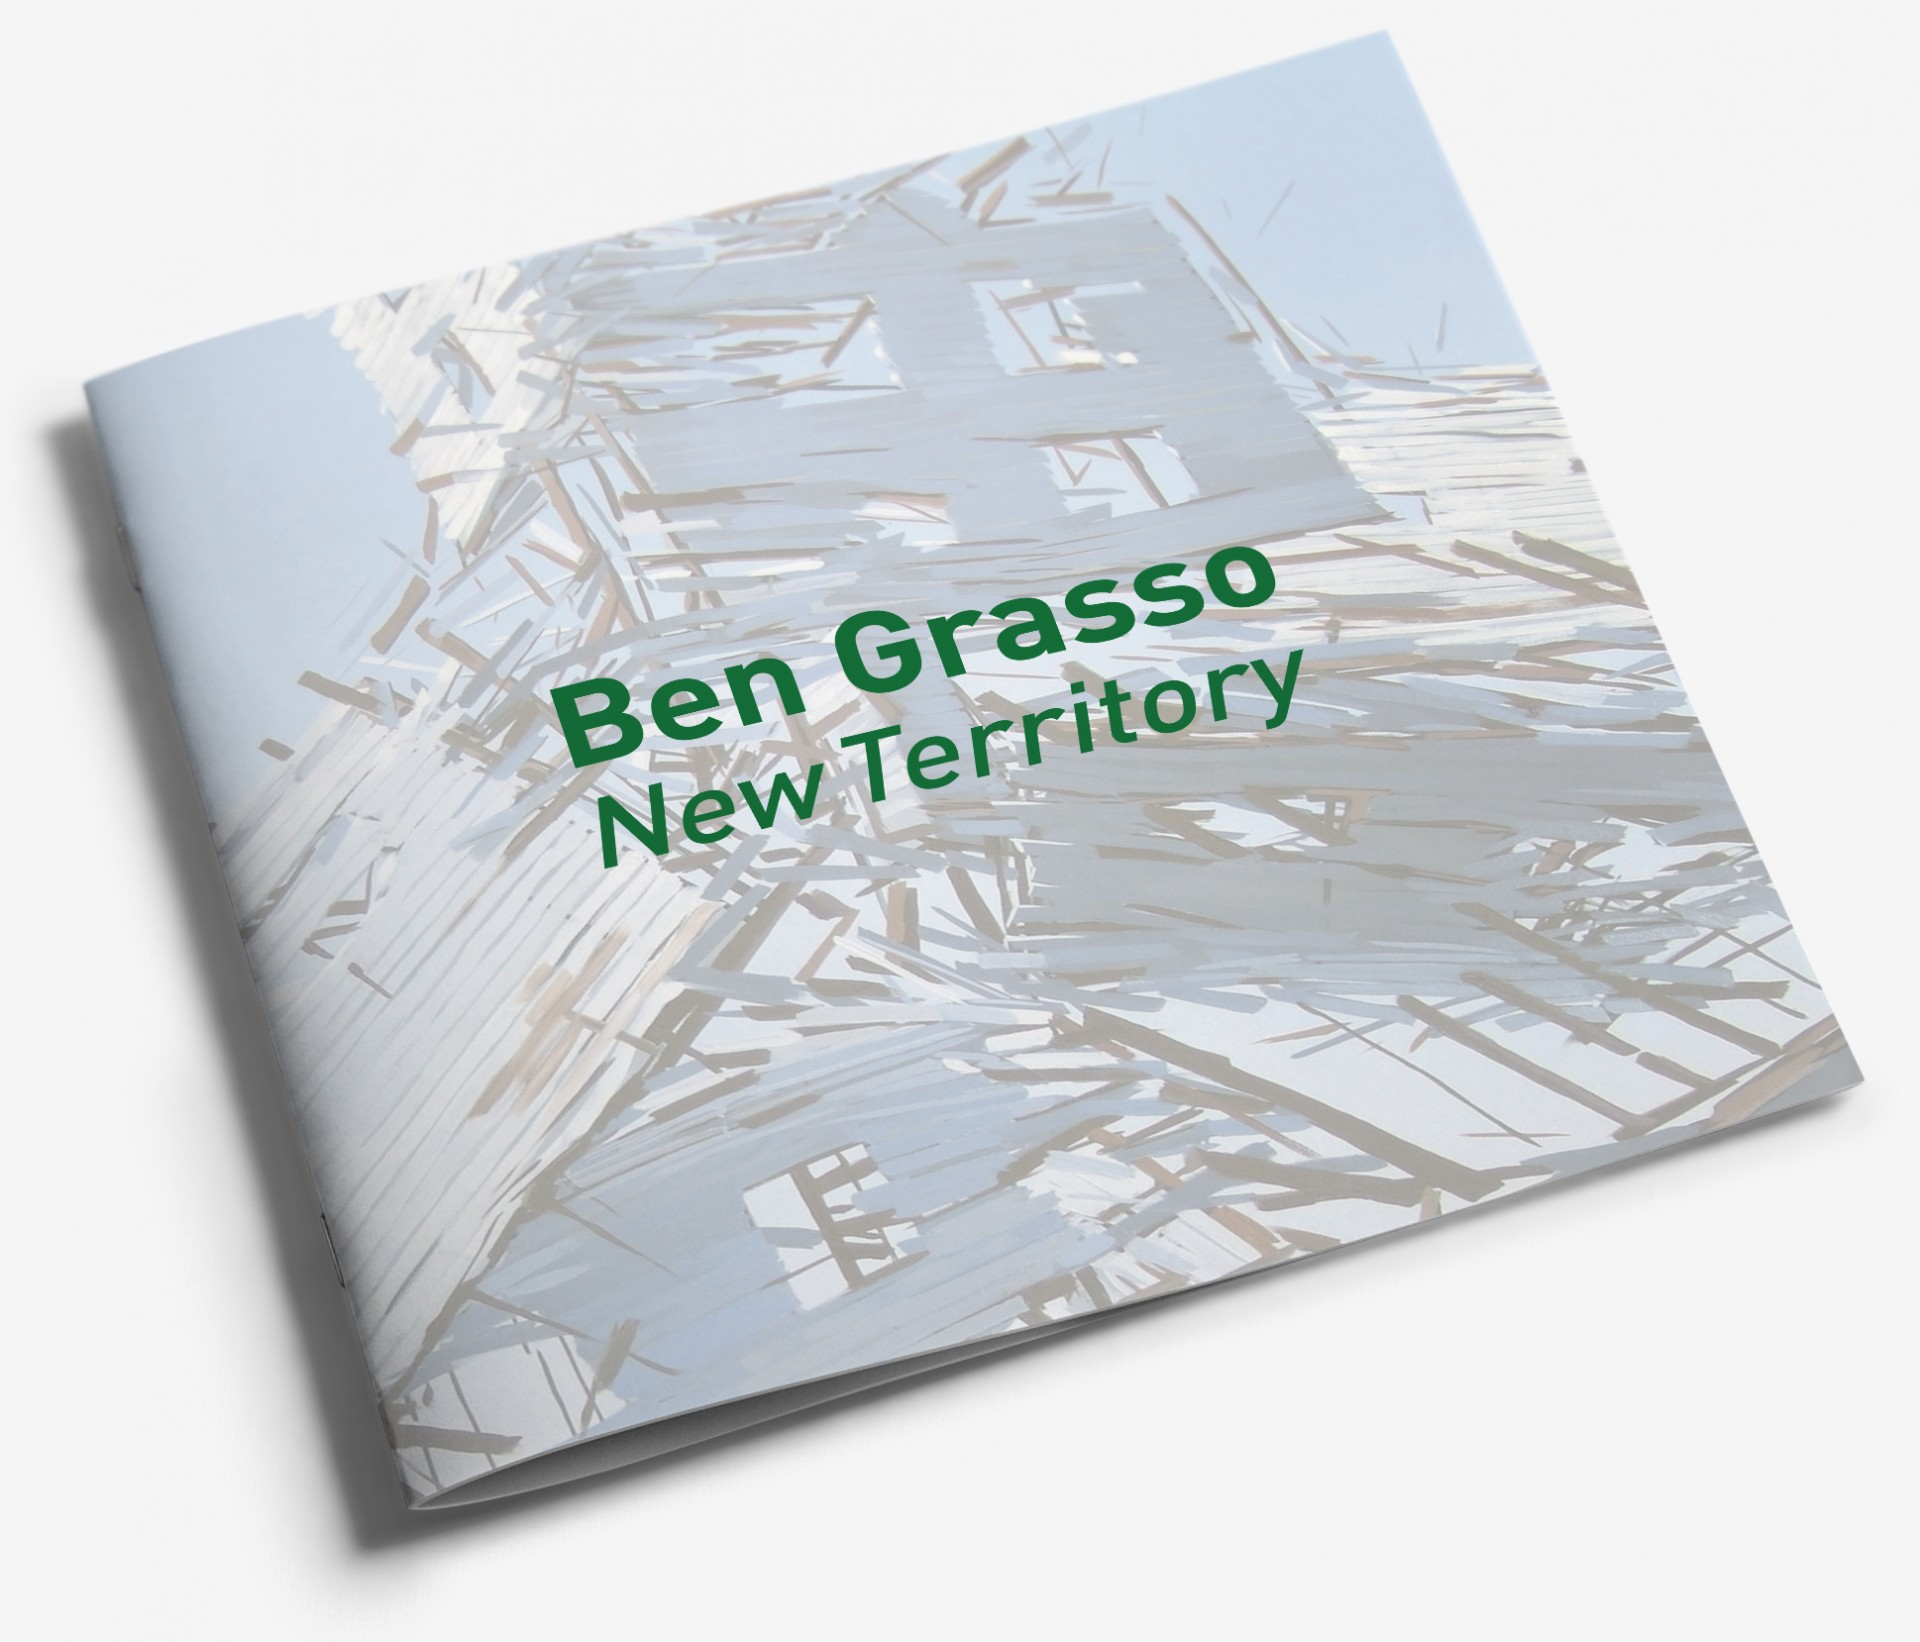 Catalogo Ben grasso - New Territory